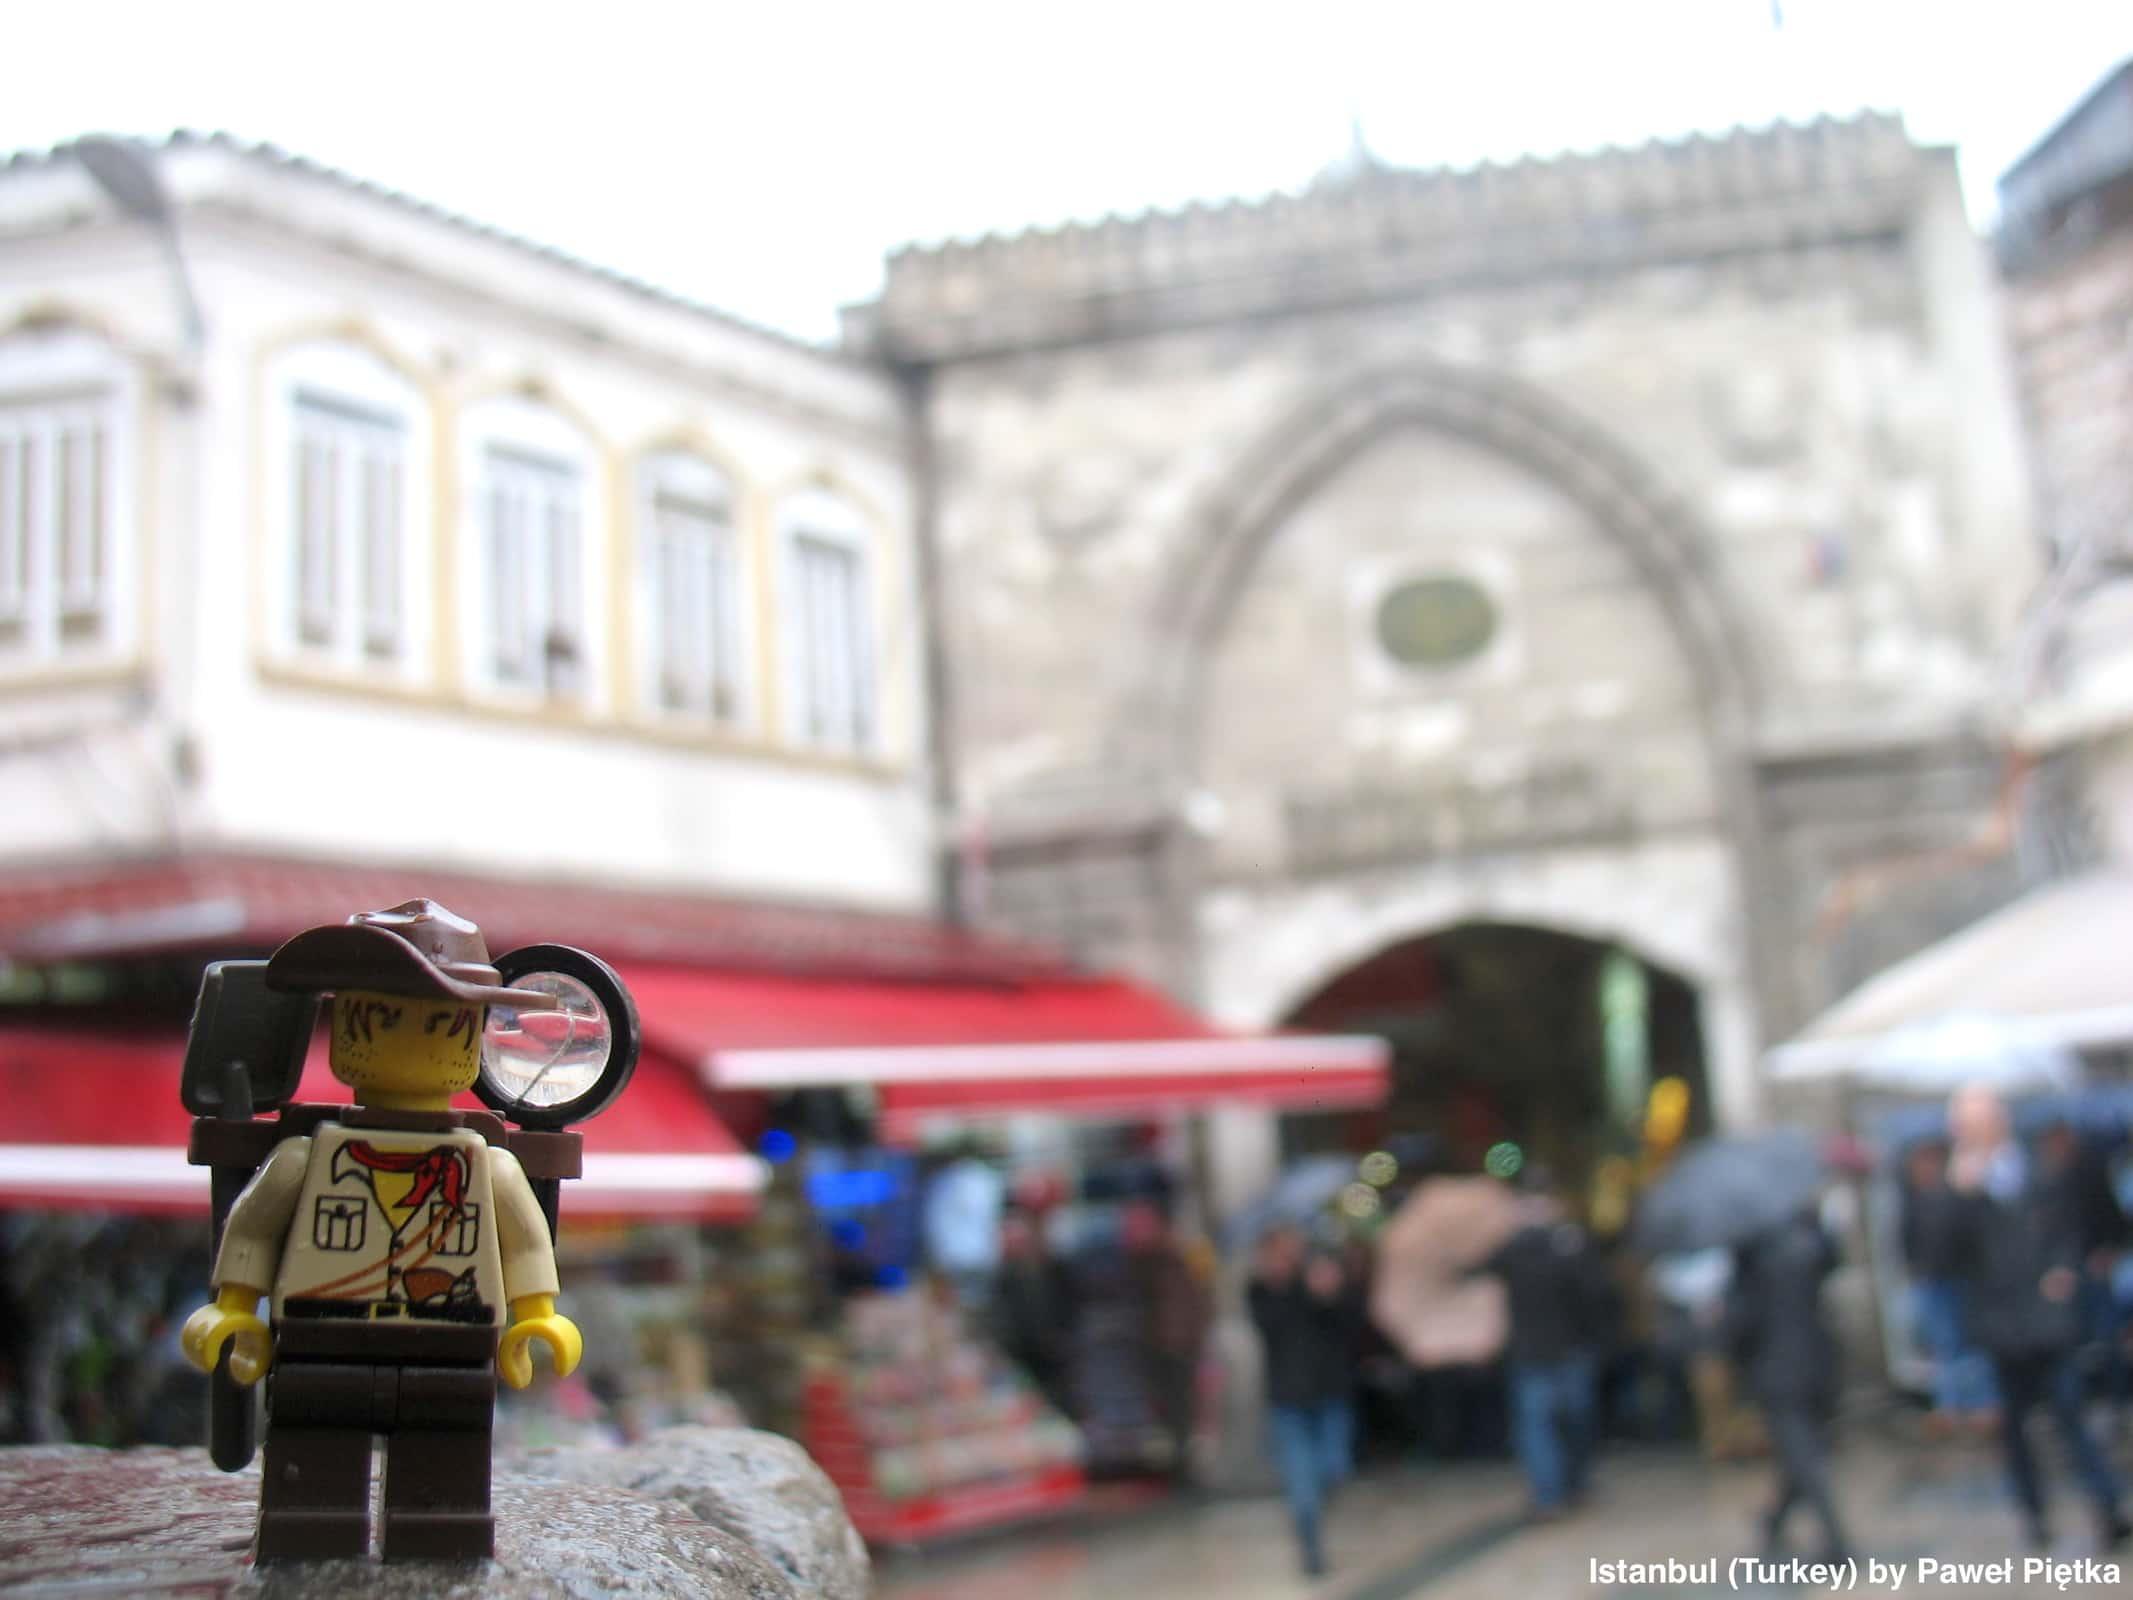 Istanbul (Turkey) - Grand Bazaar